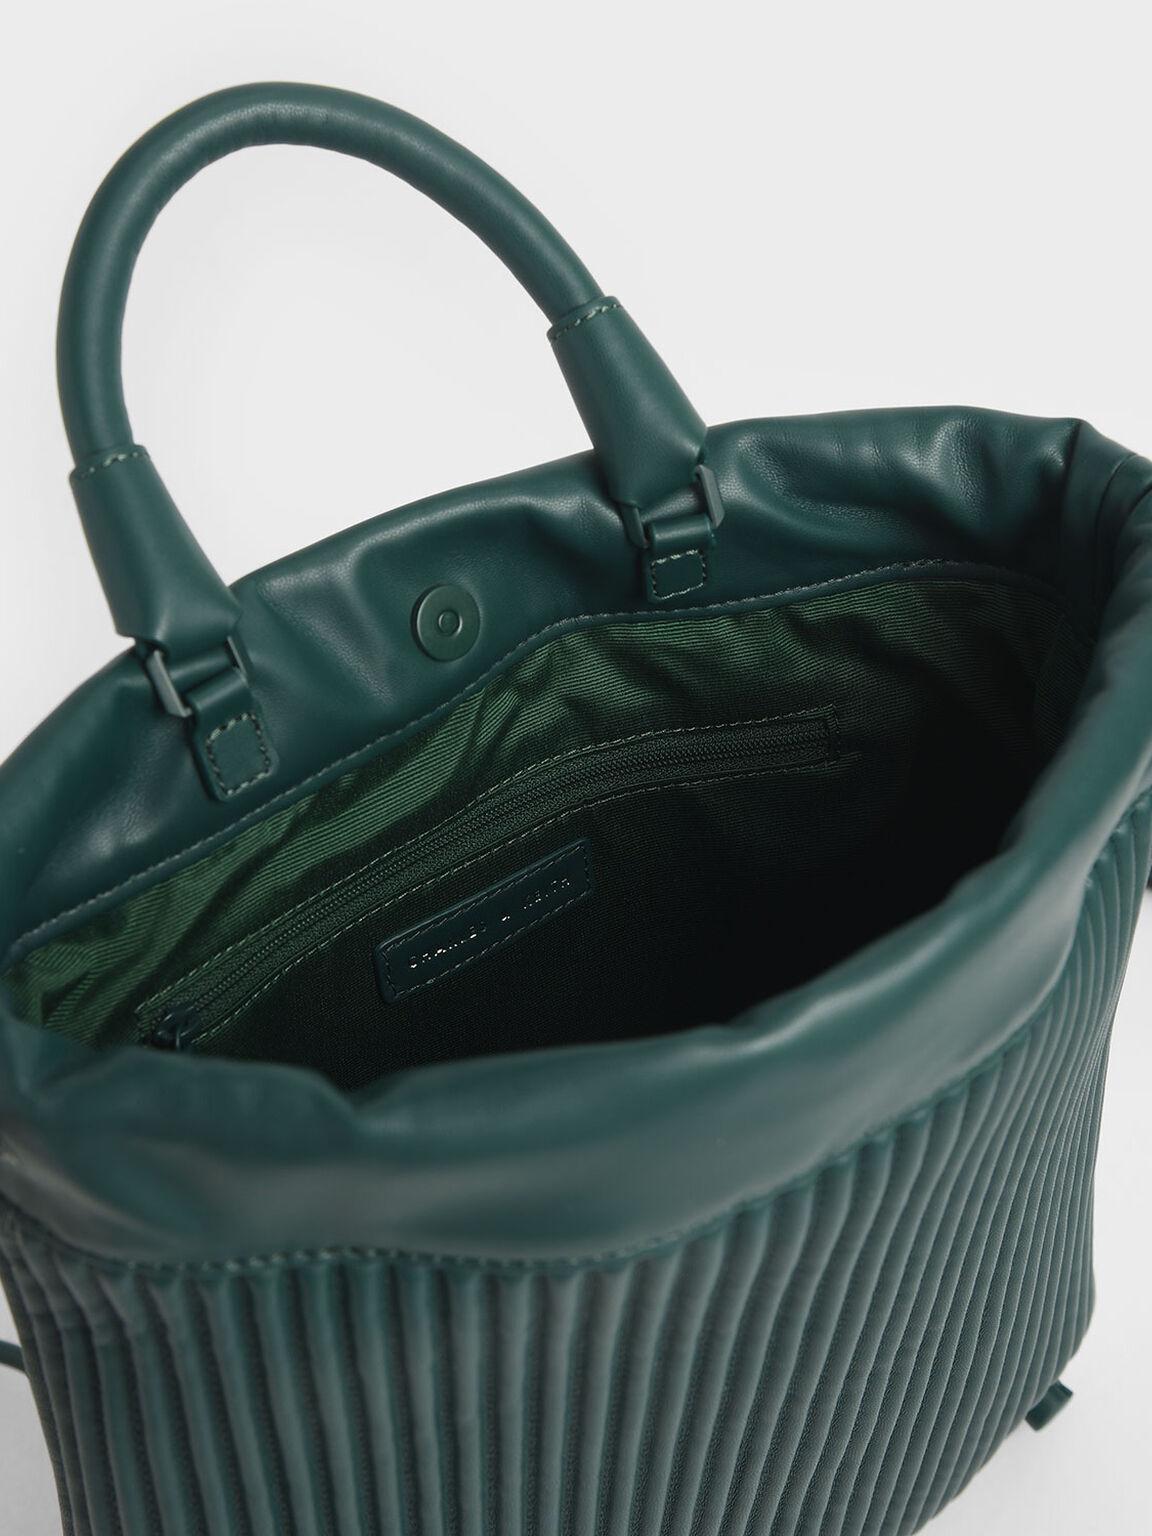 Neoprene Drawstring Backpack, Dark Green, hi-res